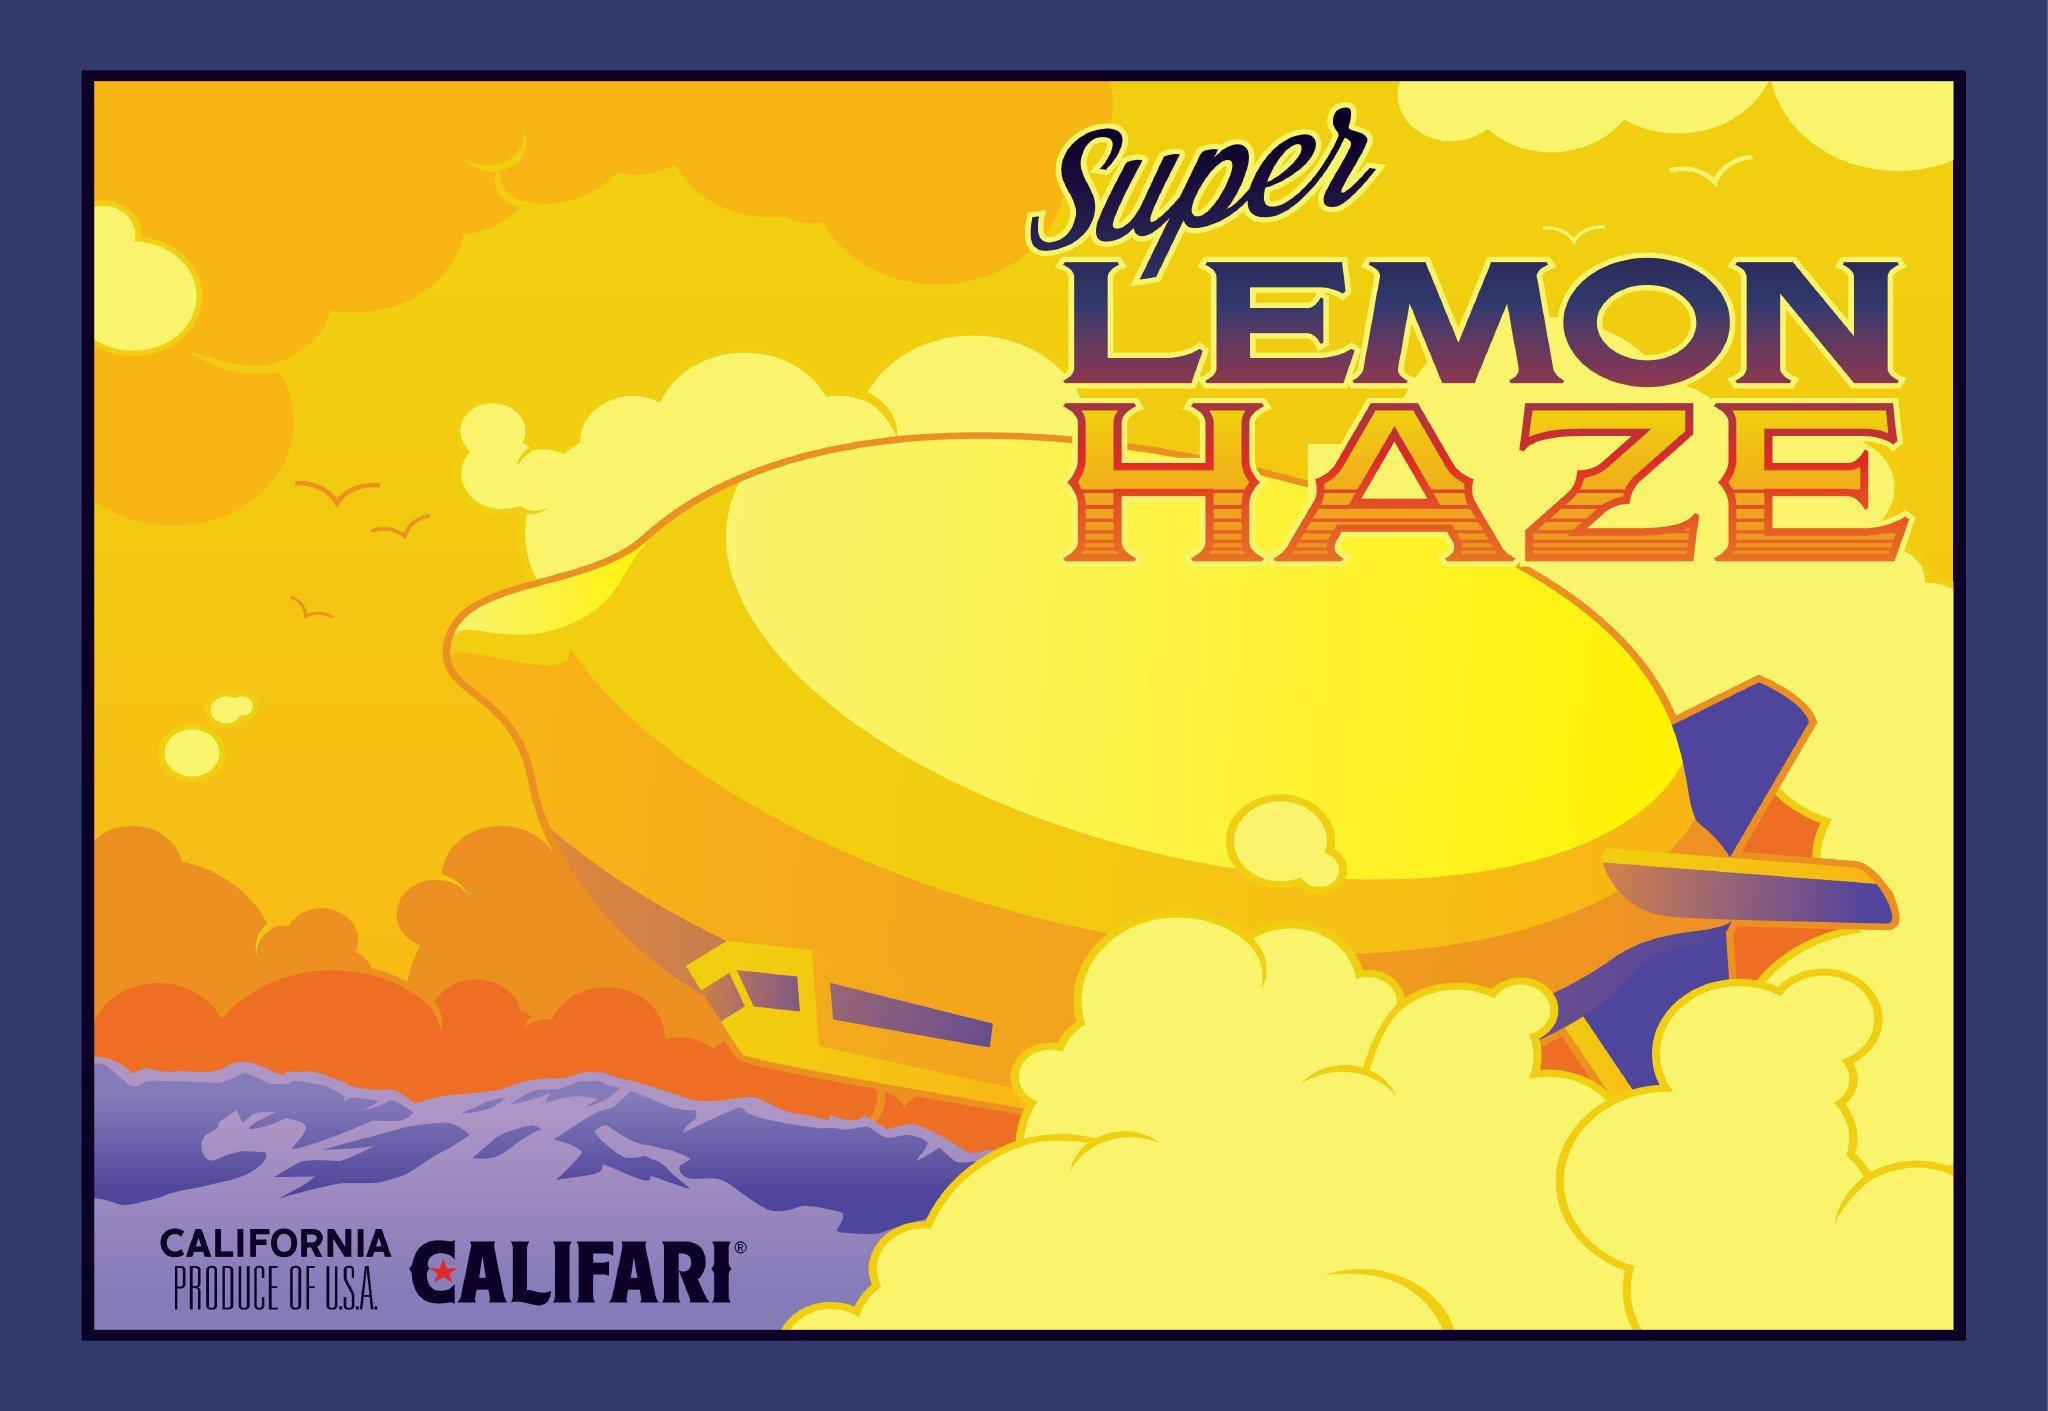 "Califari Super Lemon Haze - Vivid Color Weed Poster, Cannabis Art, Marijuana Decor for a House, Dorm, Cannabis Dispensary, Store, or Shop - 13"" x 19"" Lithograph Print"